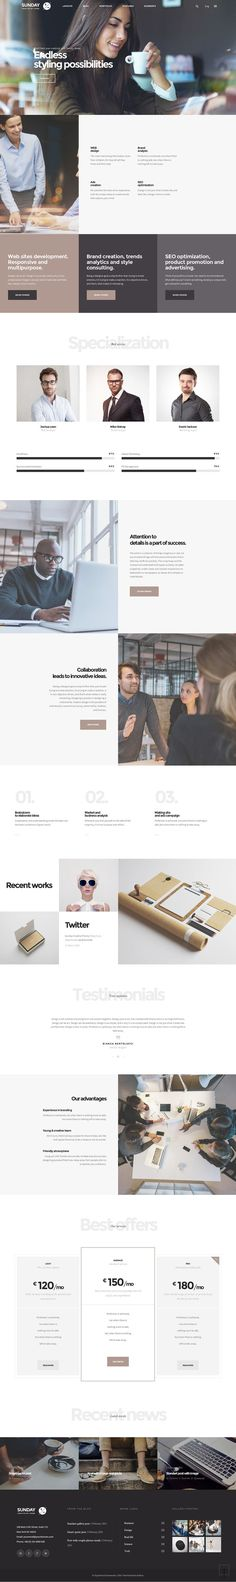 Clean & Simple WordPress Themes #2015: